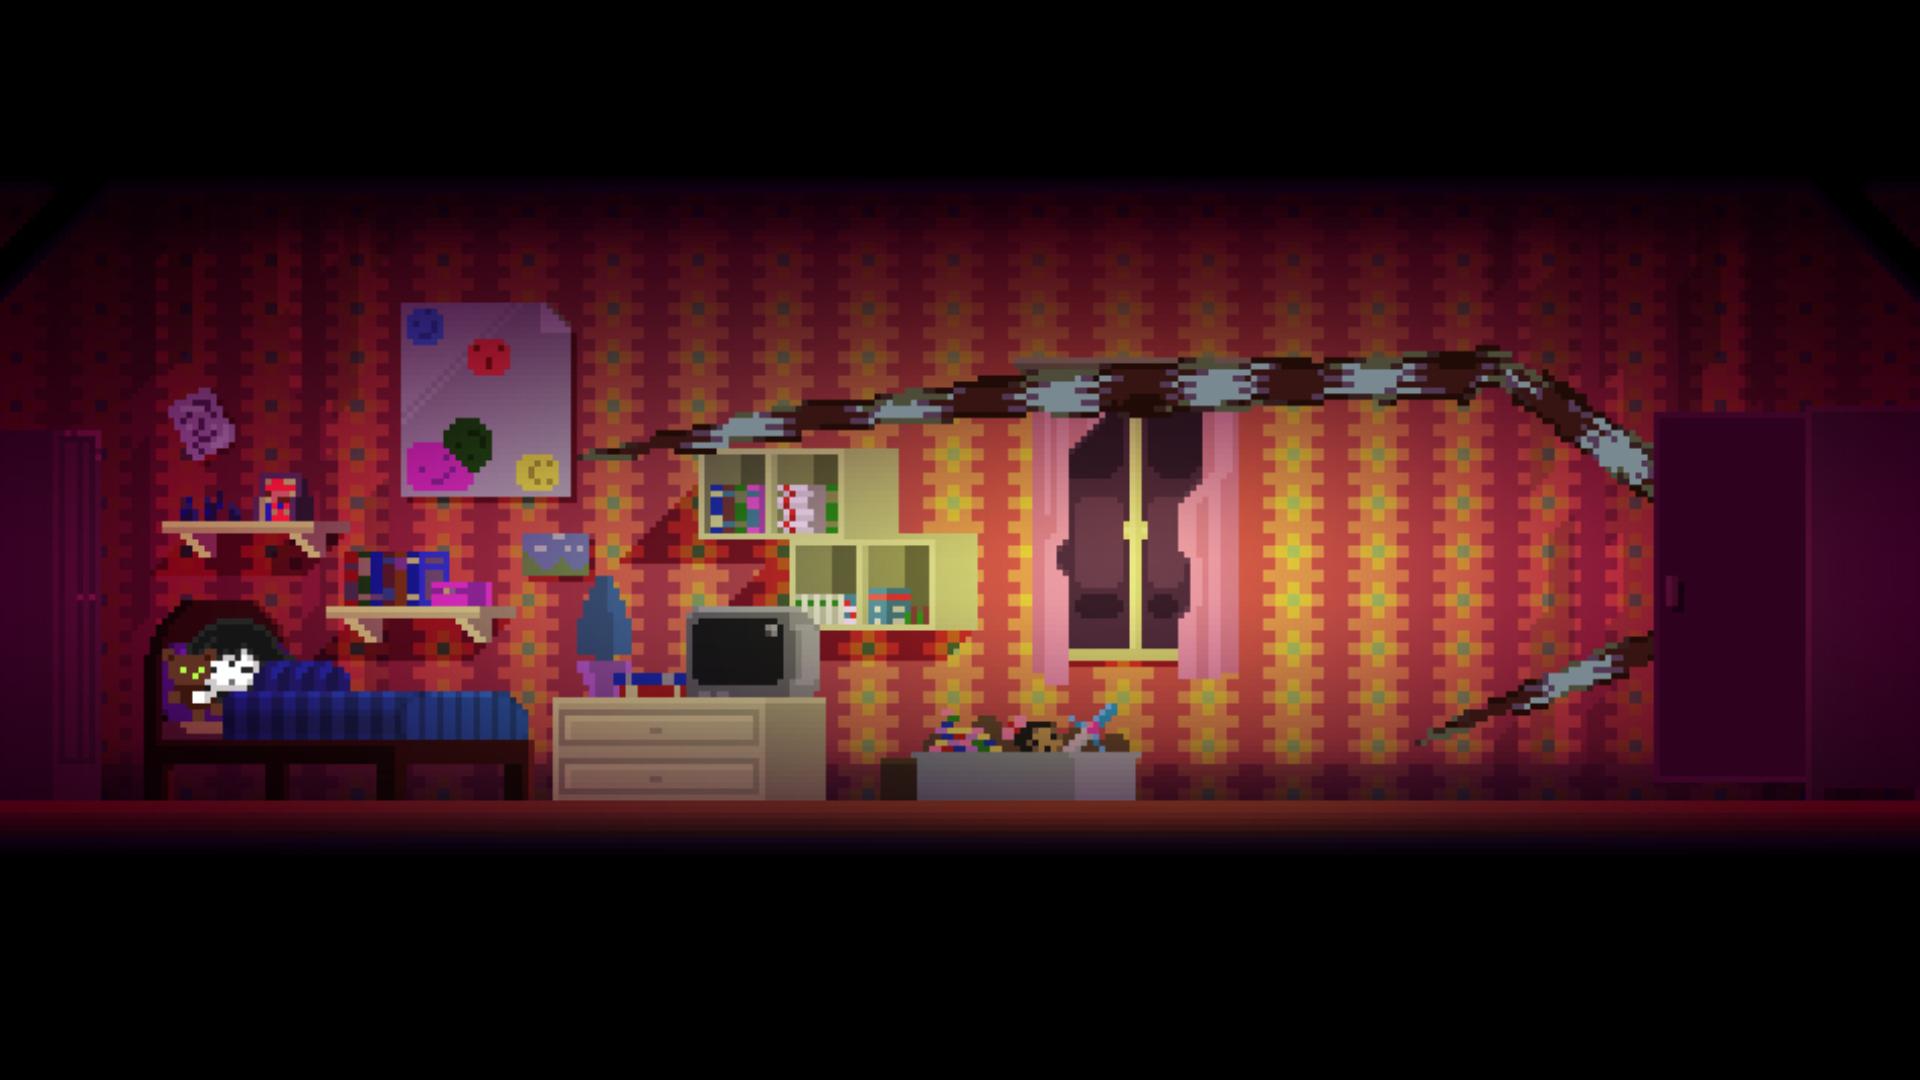 Finding Teddy - Storybird - LookAtMyGame - Blacknut Cloud Gaming